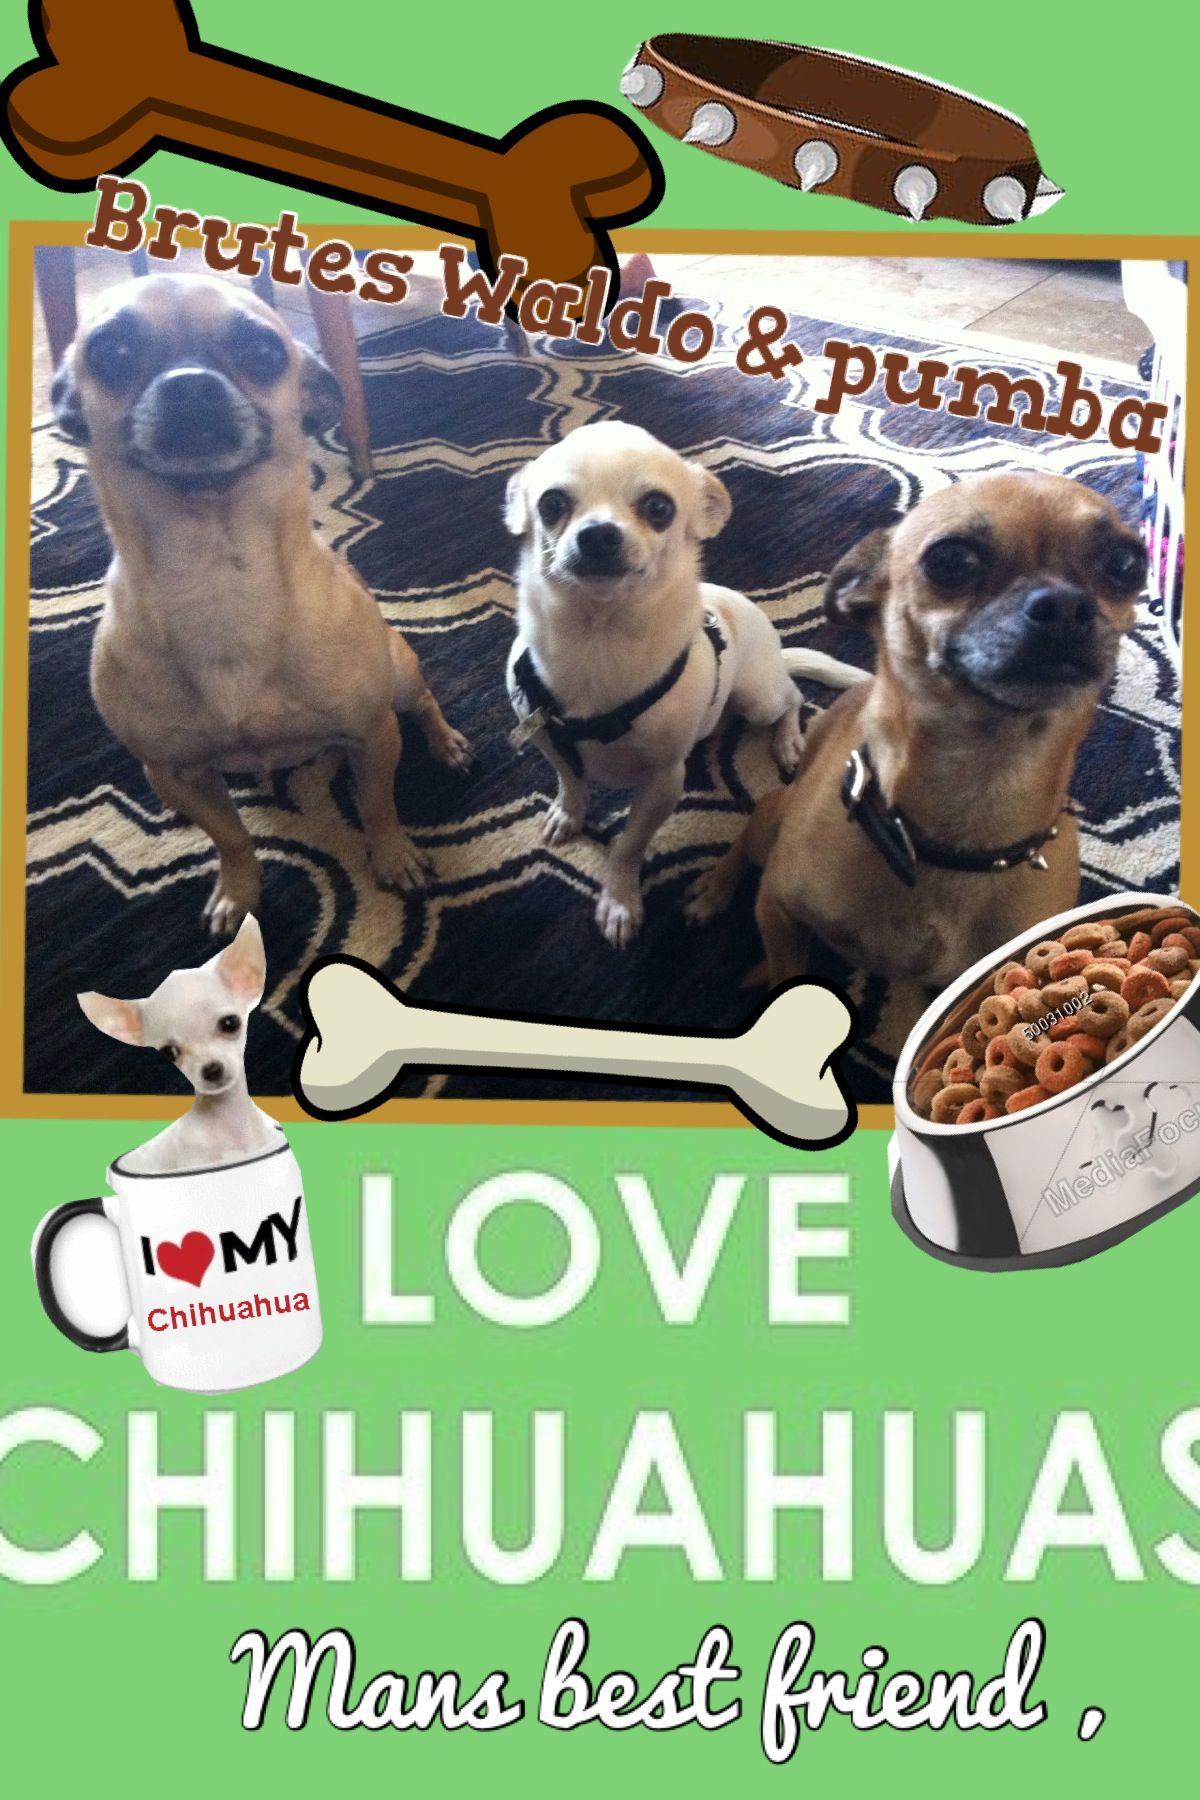 My dogs ,;) I love chihuahuas!